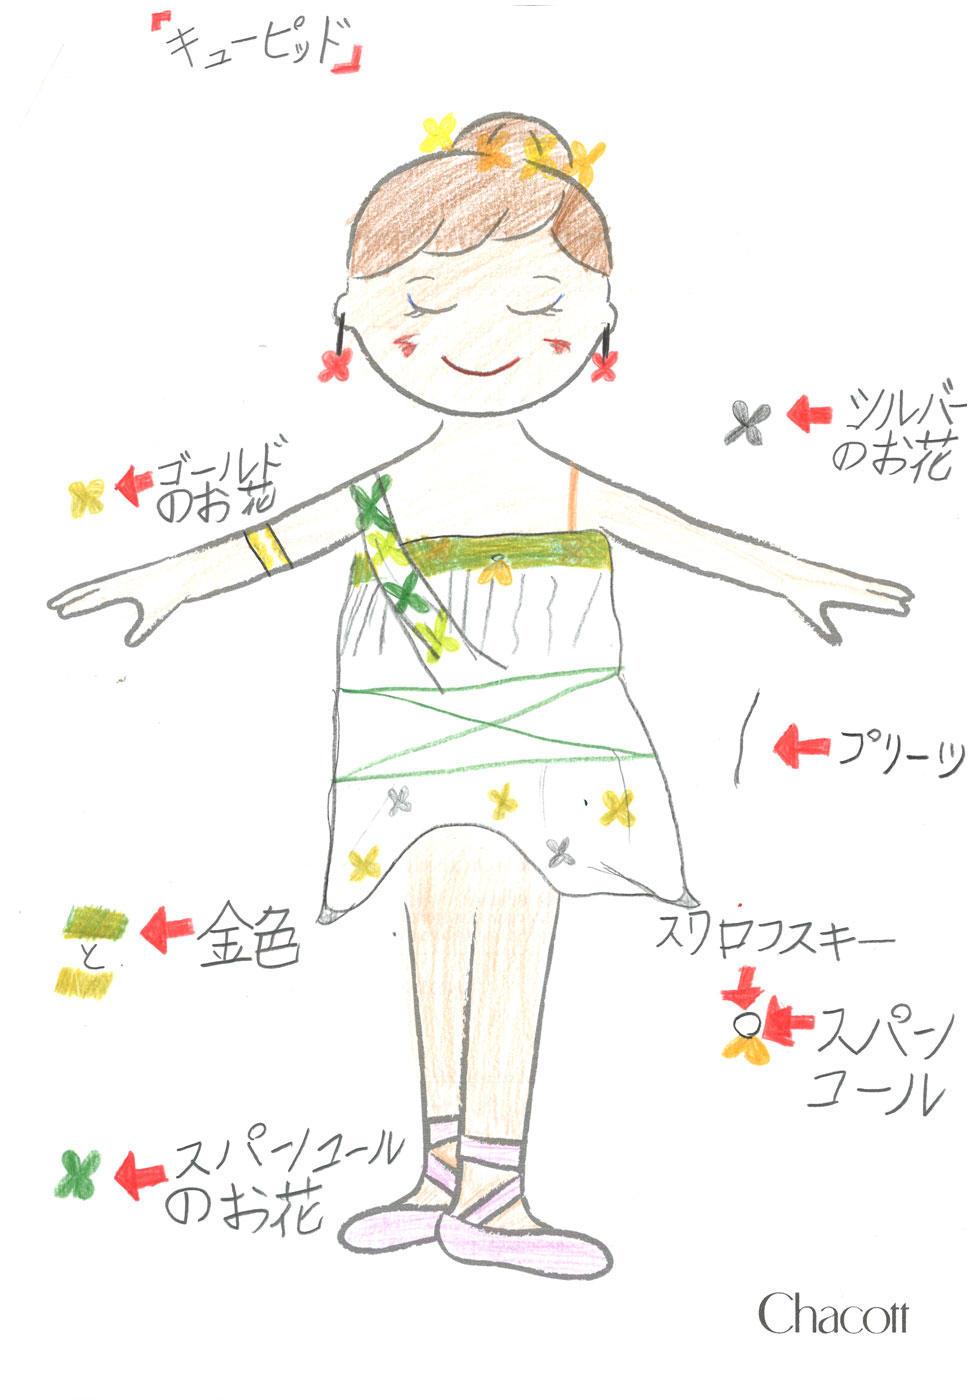 shibuya_costume_design_2020_017.jpg